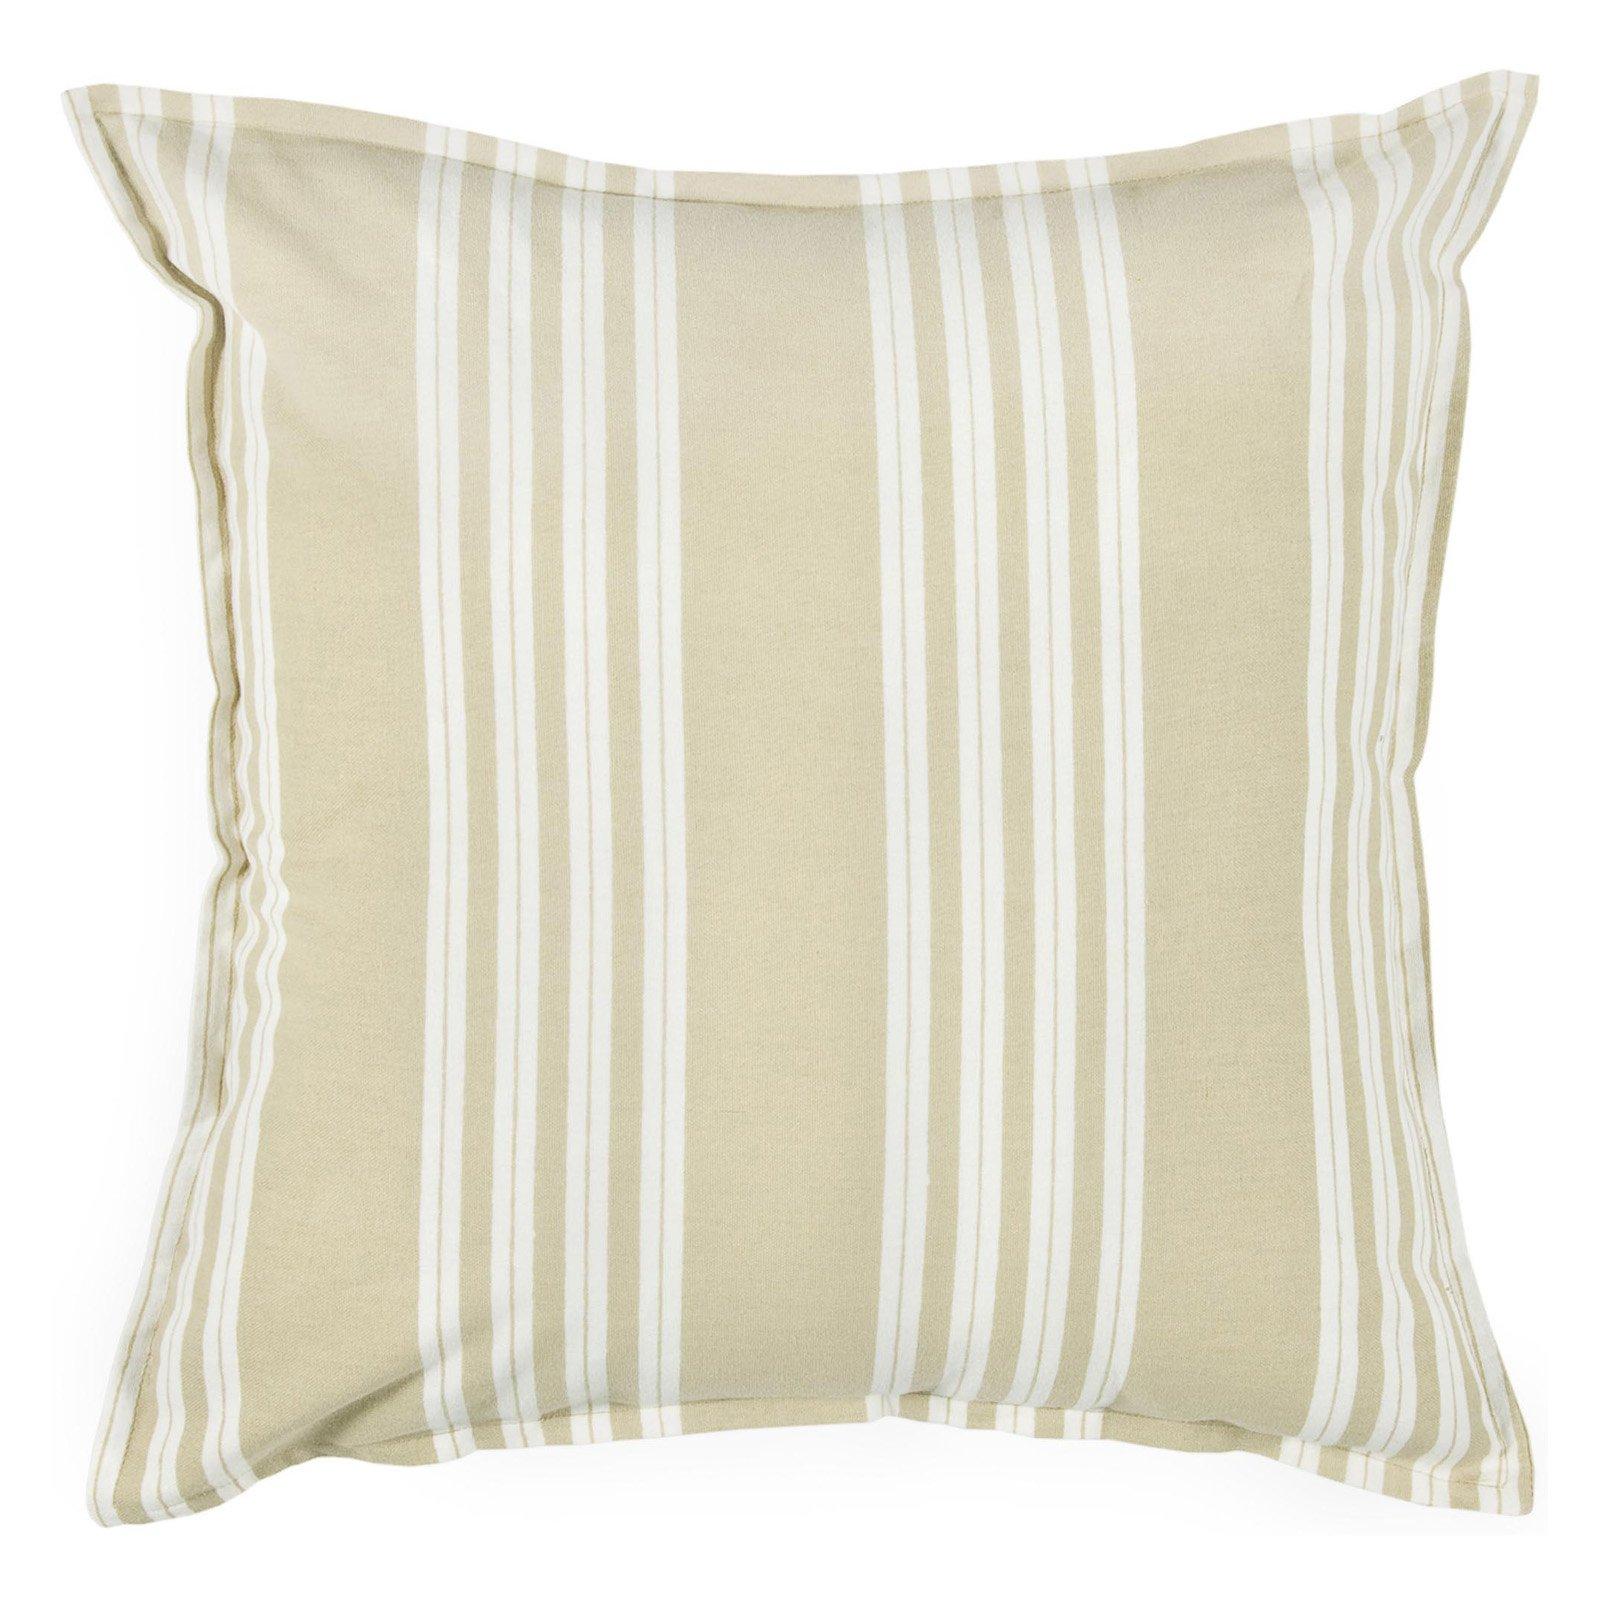 "Rizzy Home stripe18"" x 18""Cotton decorative filled pillow"